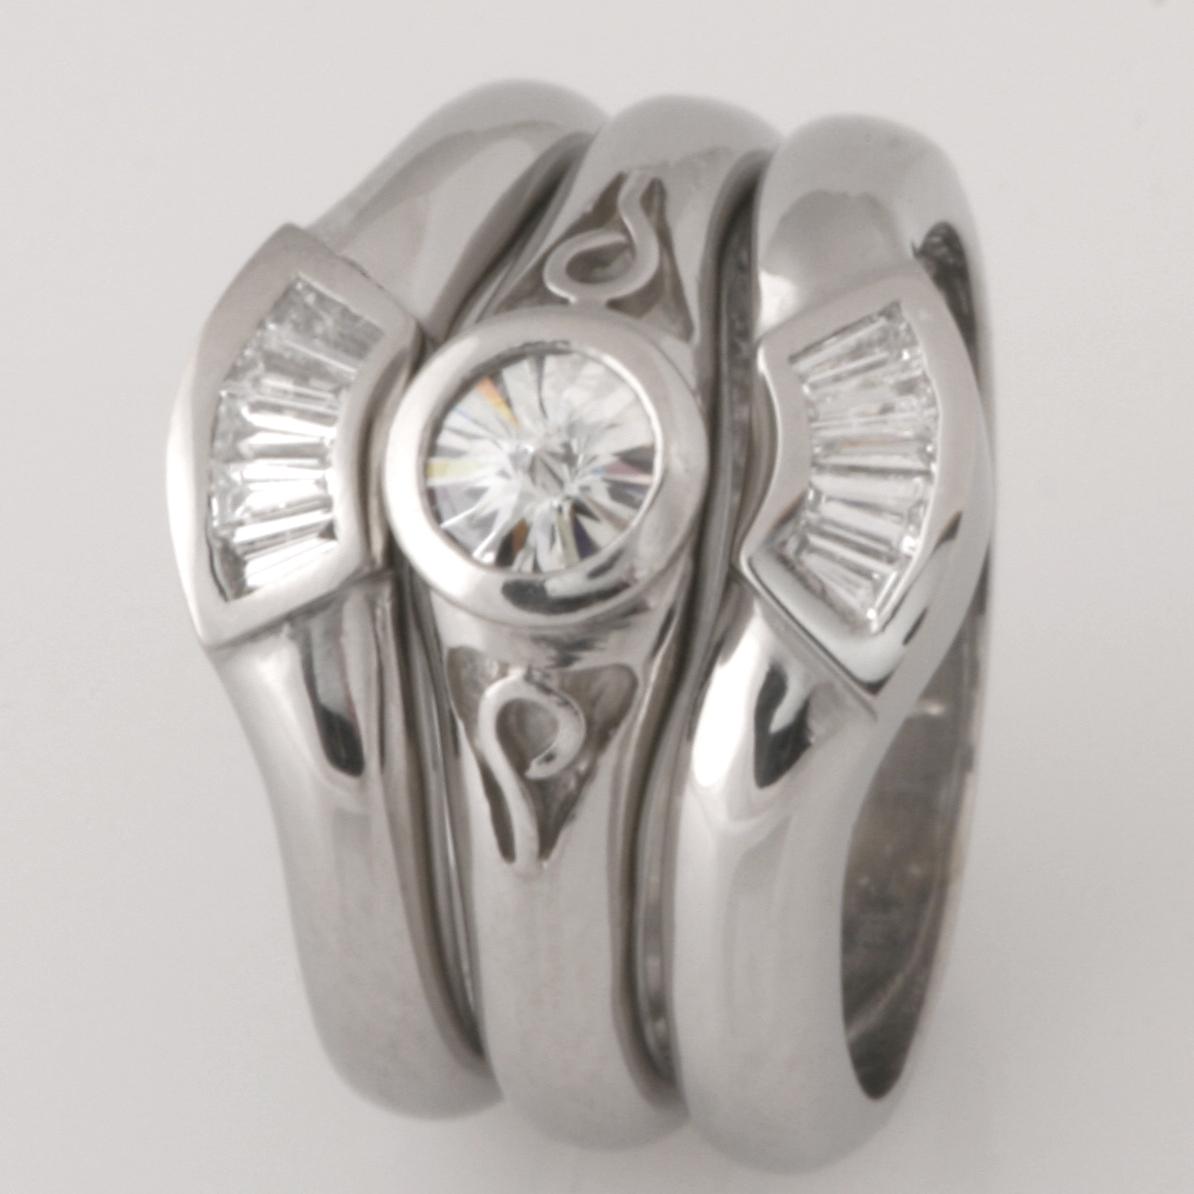 Handmade ladies palladium baguette diamond wedding rings